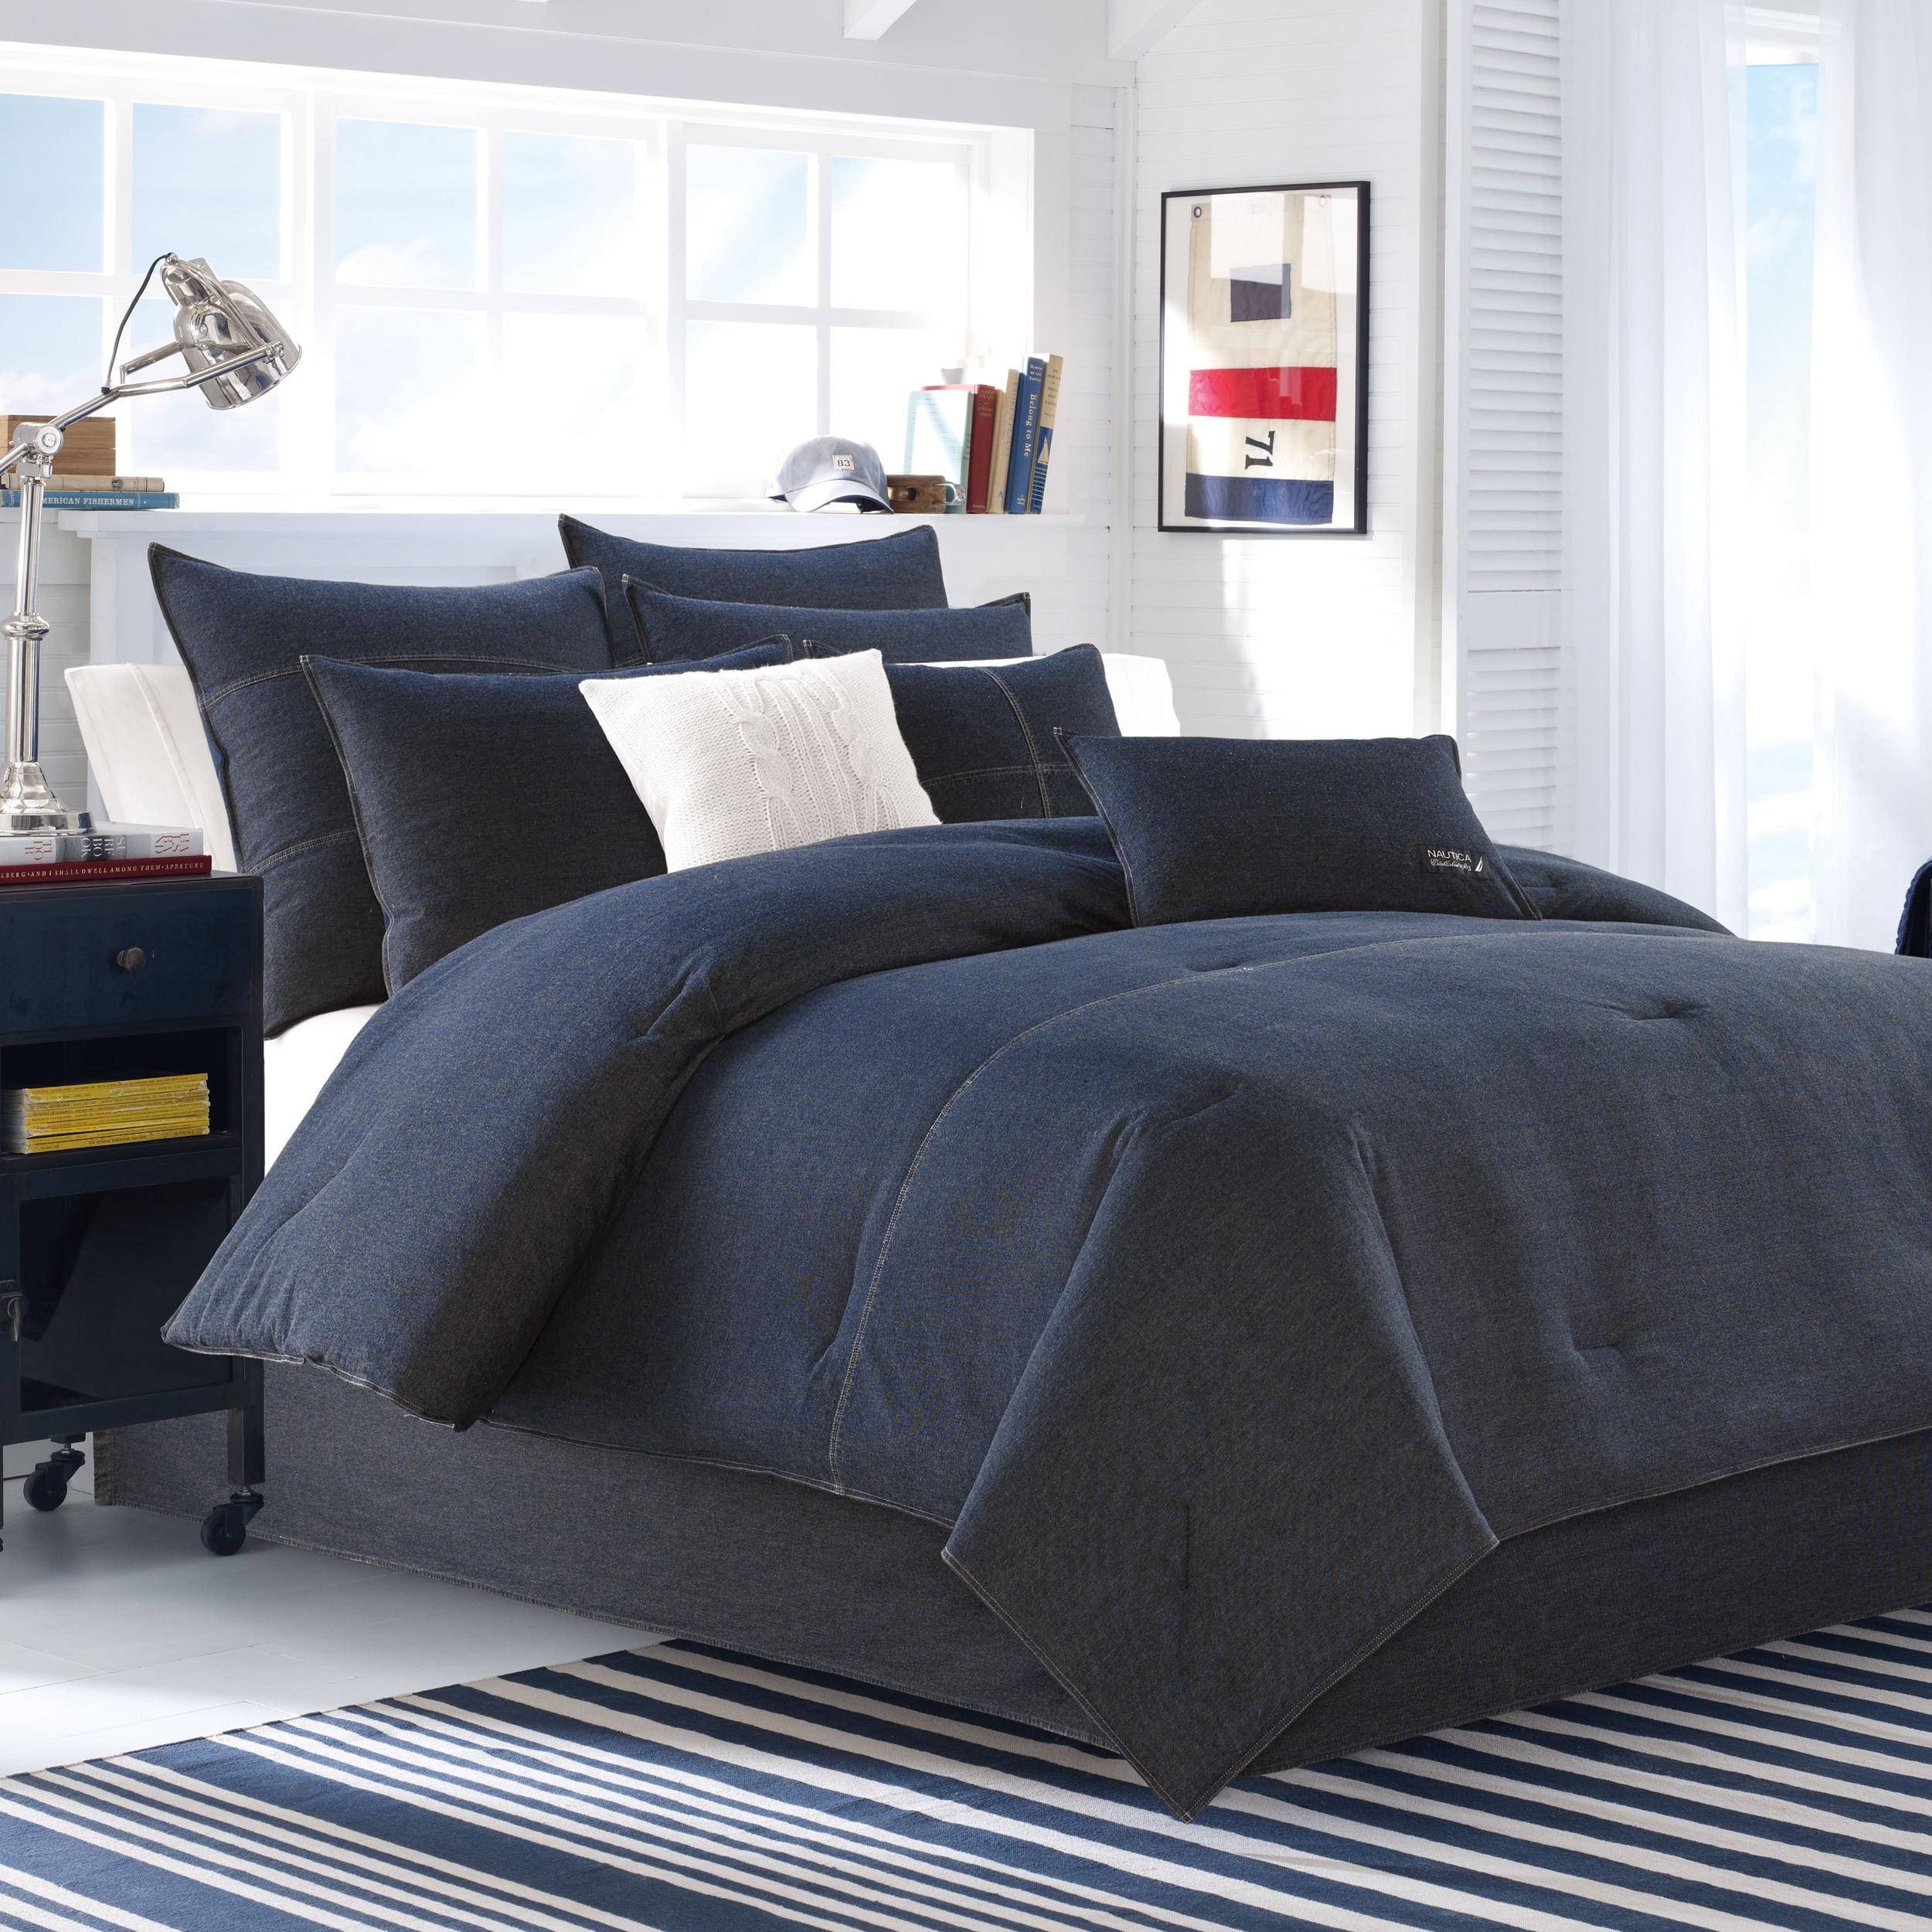 Nautica Seaward Denim 3-piece Comforter Set - Free Shipping Today -  Overstock.com - 17450649